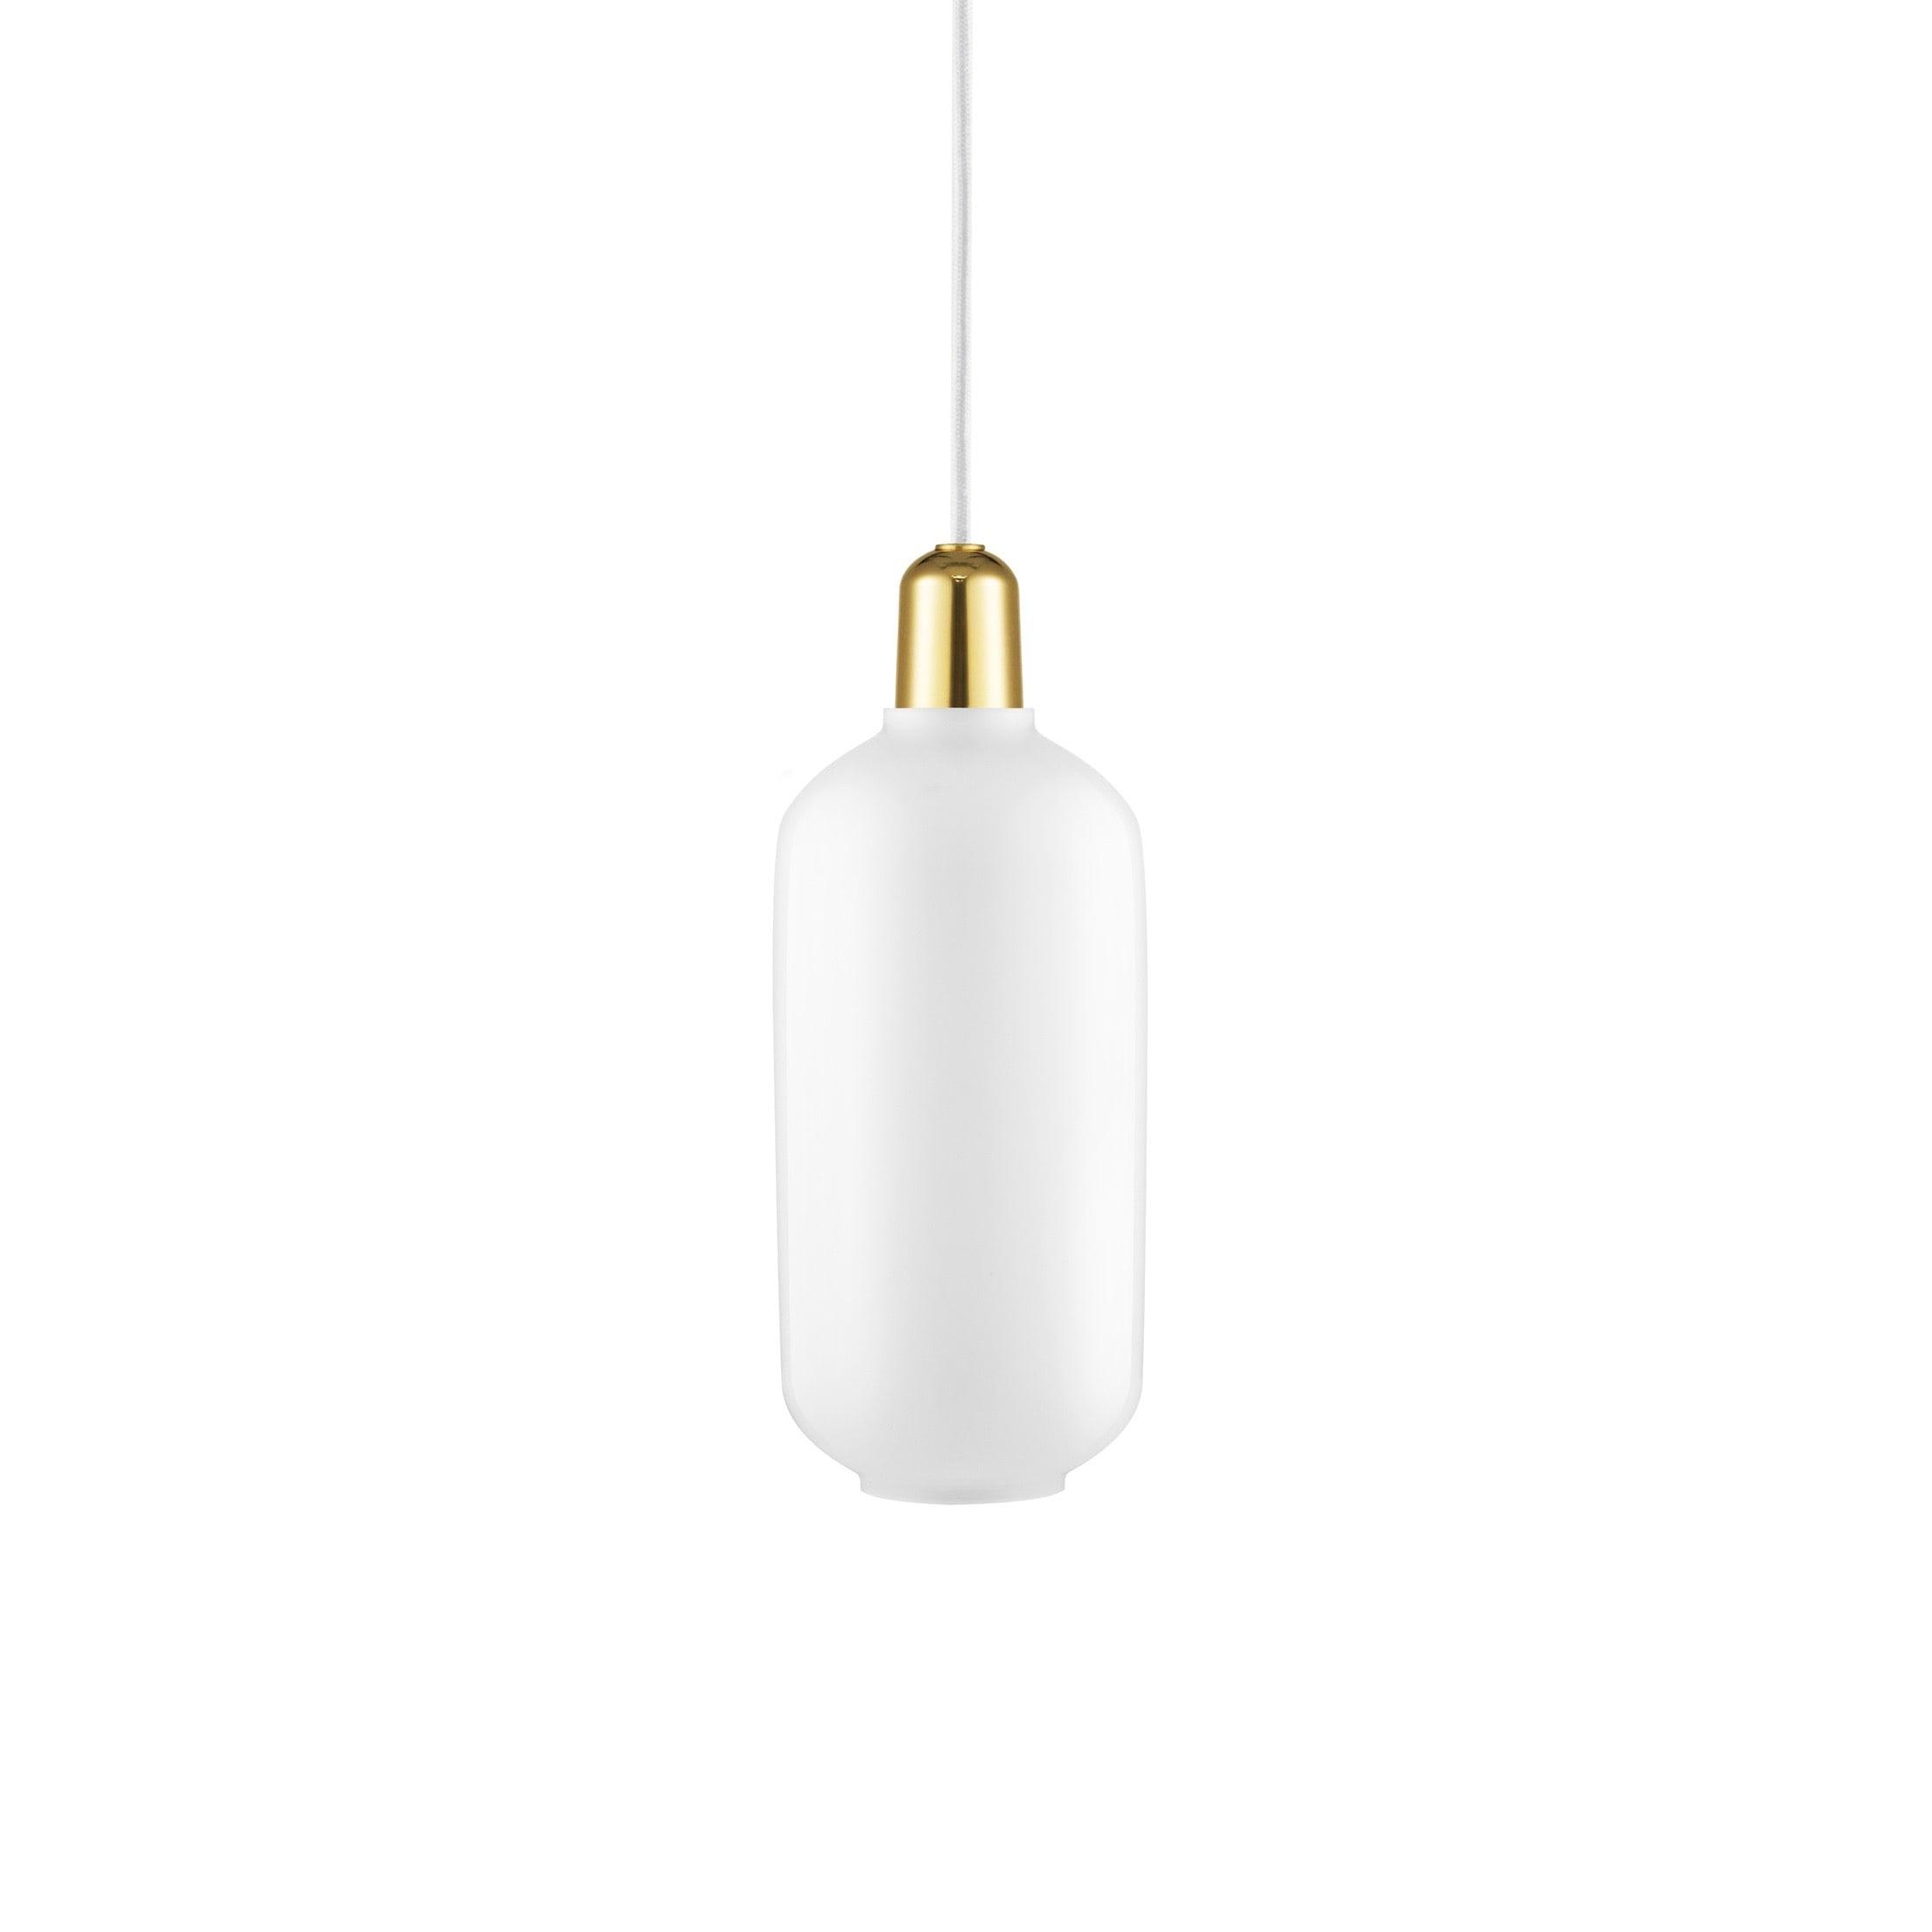 Amp Taklampa L white/brass